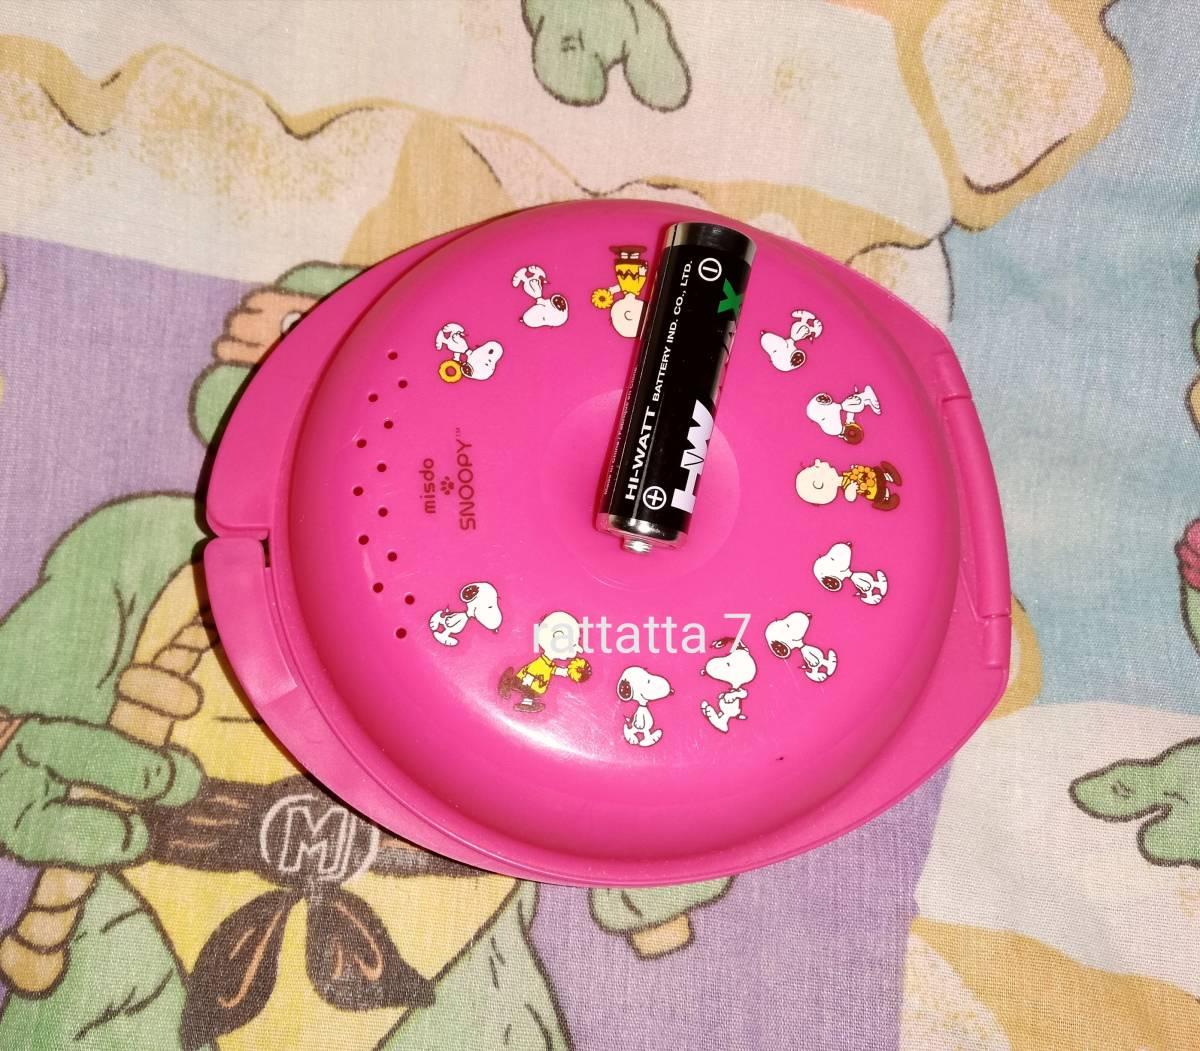 ☆Mister Donut☆SNOOPY☆PEANUTS☆Woodstock☆ミスタードーナツ☆スヌーピー☆ウッドストック☆チャーリー☆ポッケリング☆ドーナツケース_画像5